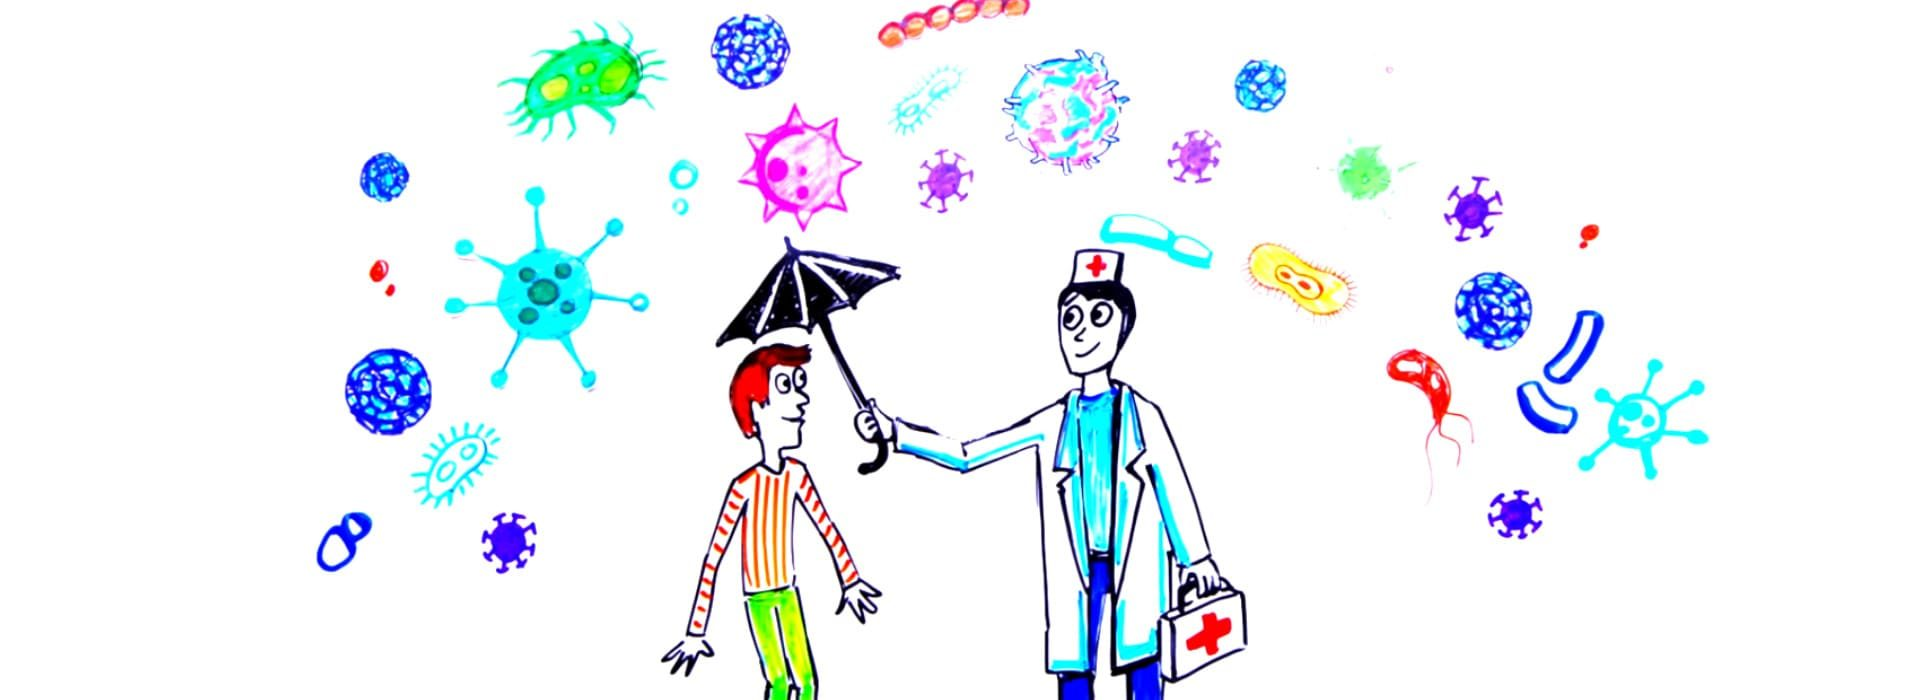 Что снижает иммунитет?